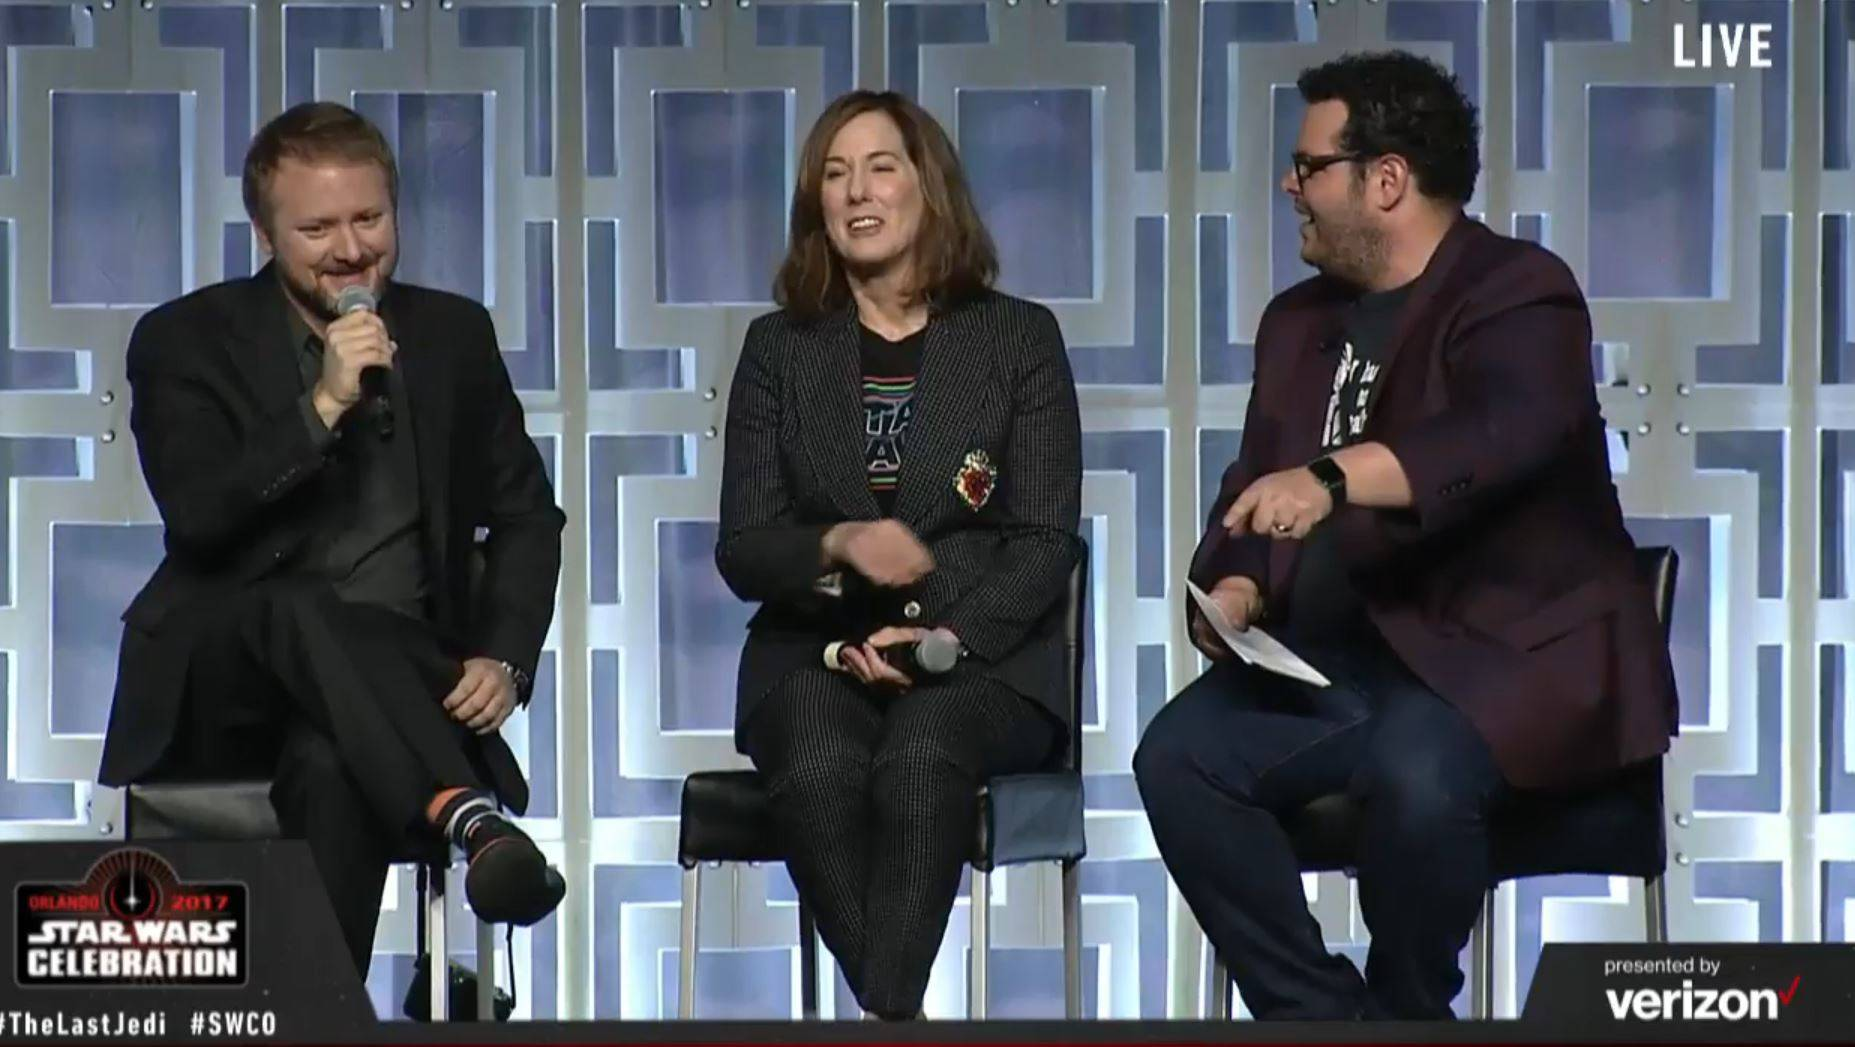 Как это было: презентация «Последние джедаи» на фестивале Star Wars Celebration 1